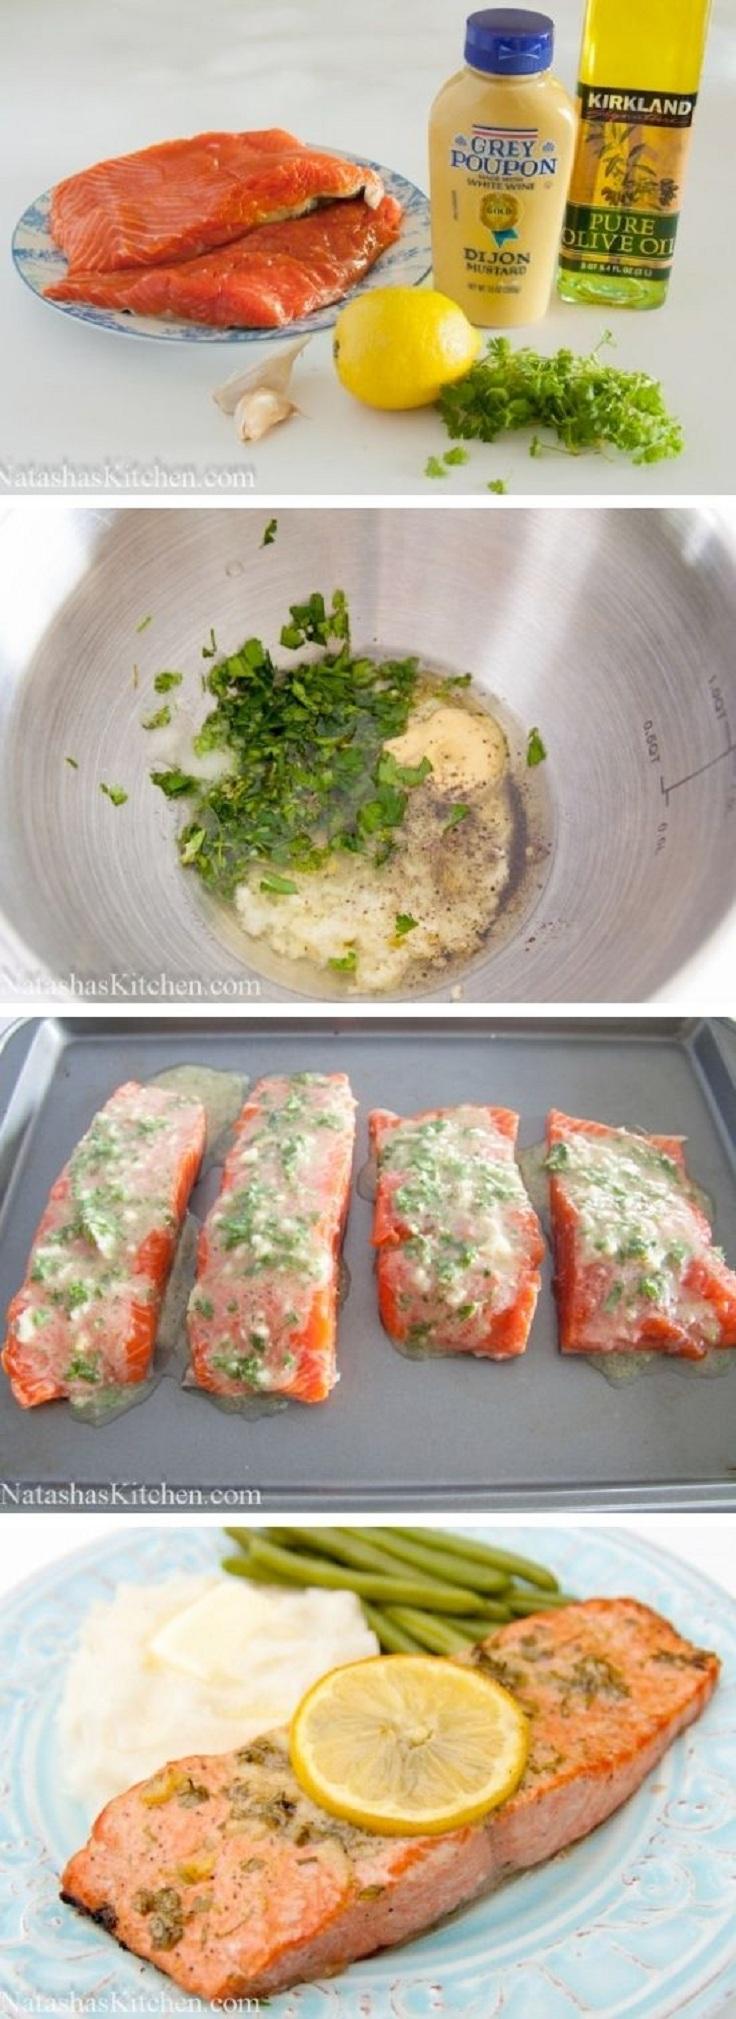 salmon-recipes_06